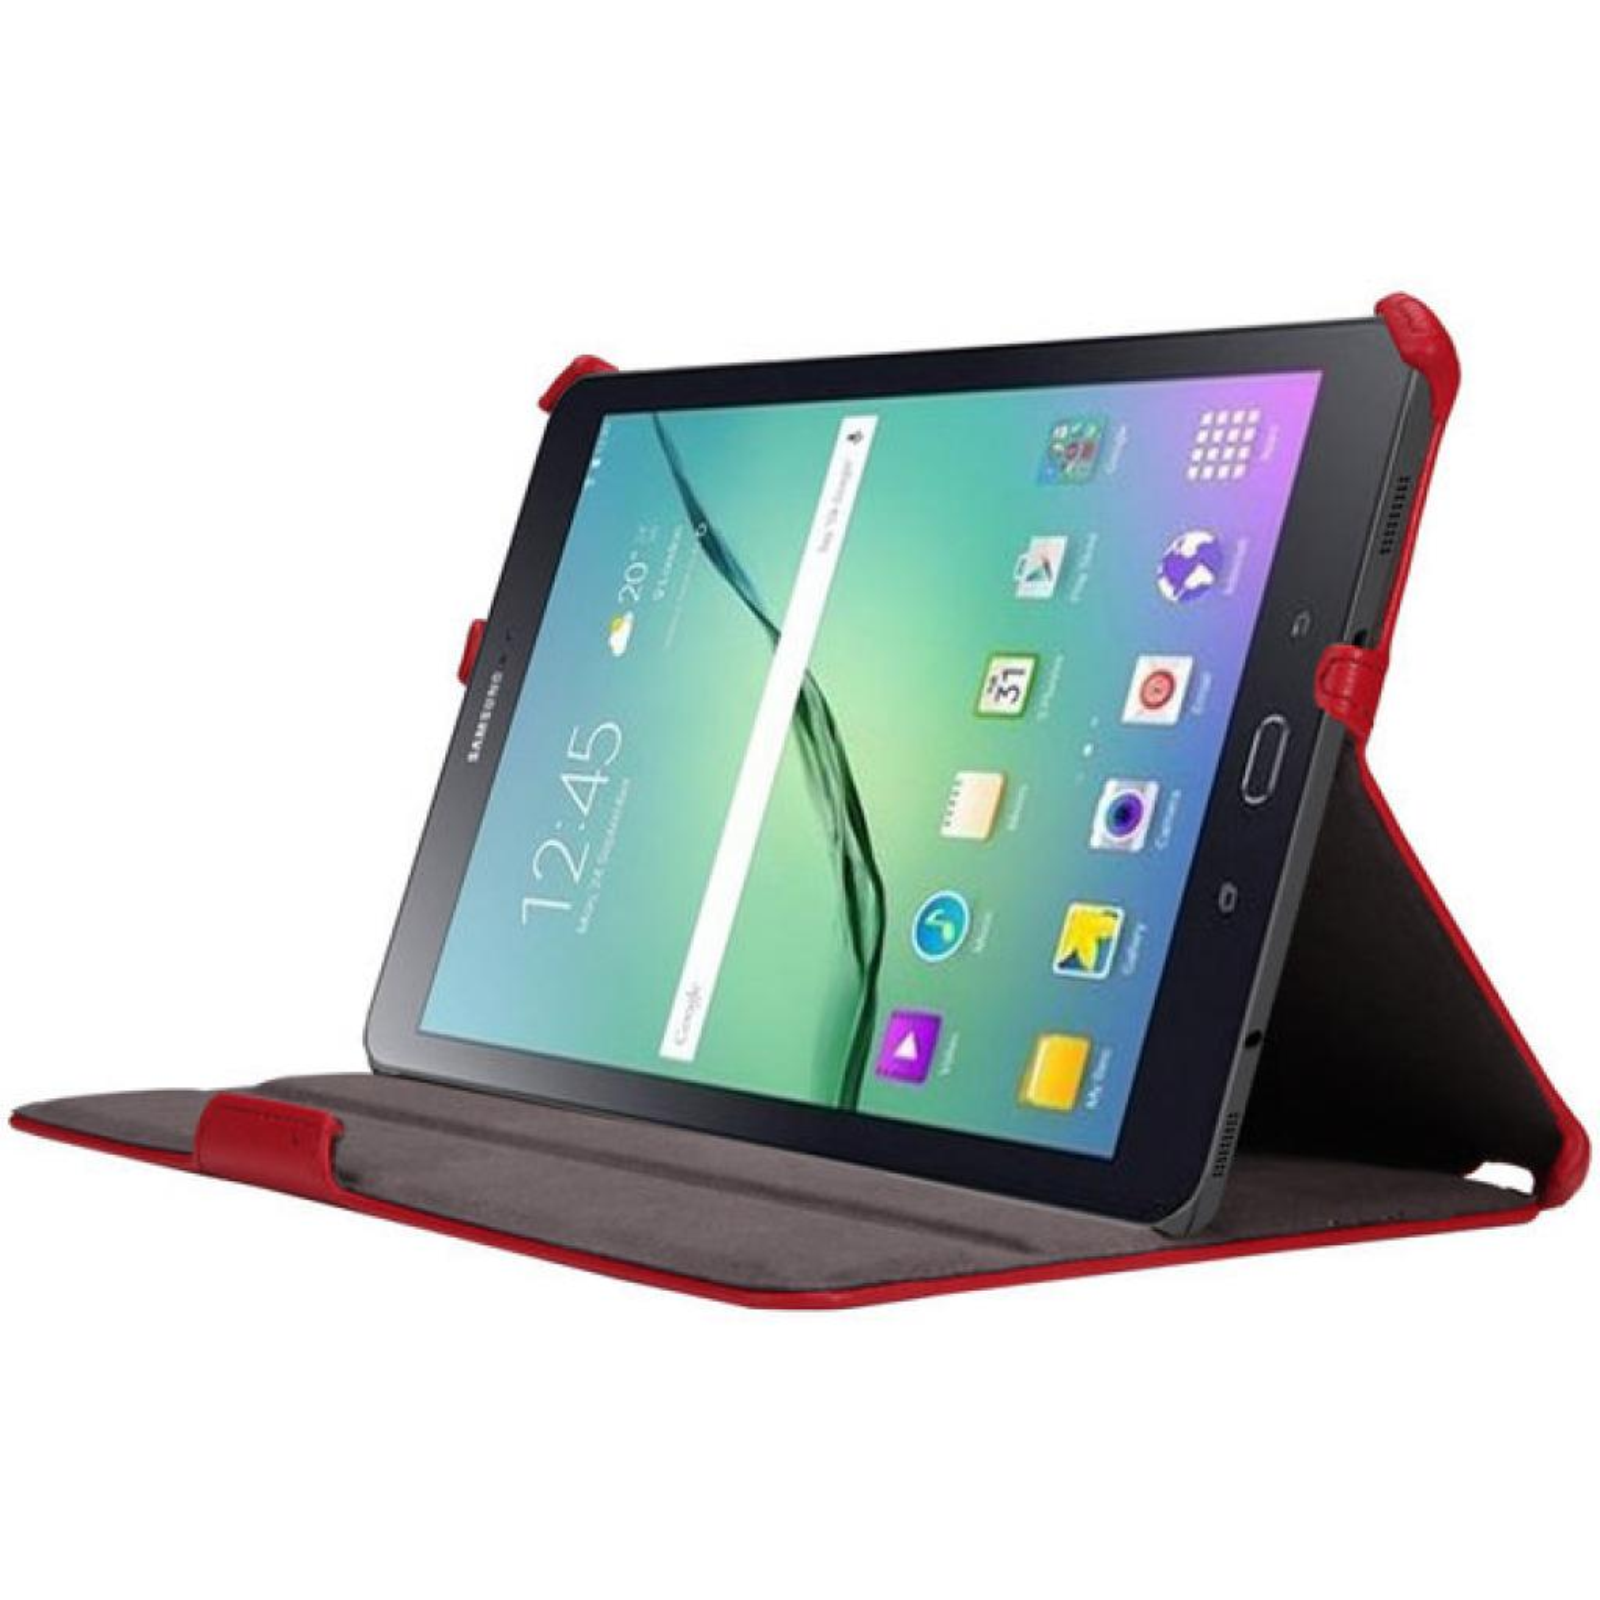 Чехол для планшета AirOn для Samsung Galaxy Tab S 2 9.7 red (4822352777456) изображение 5